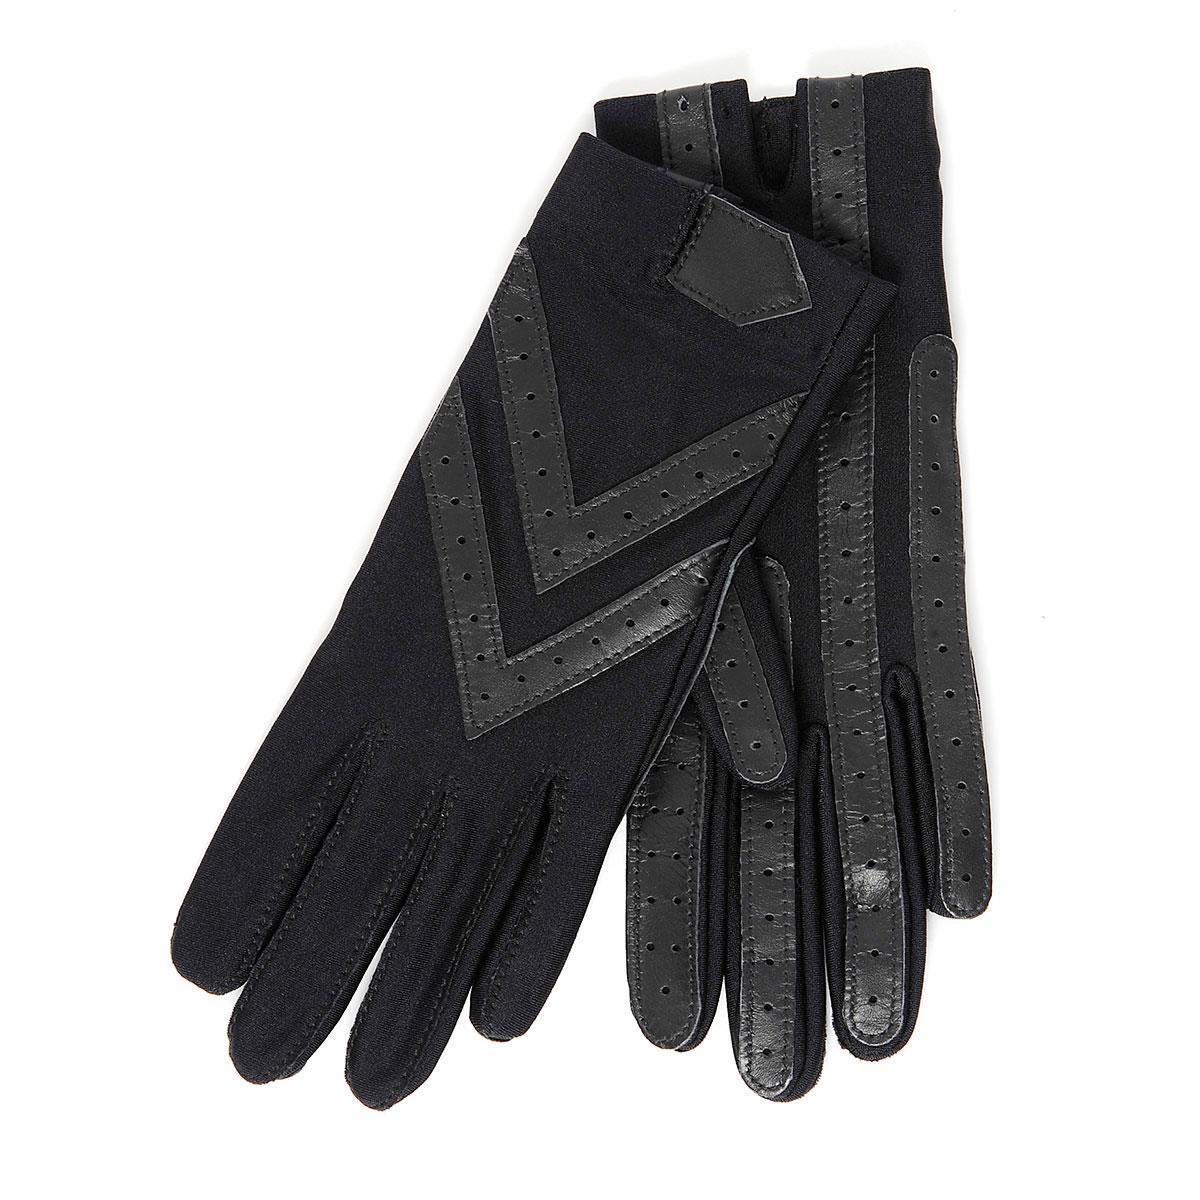 Ladies thermal leather gloves uk - Isotoner Wonderfit Stretch Gloves Black